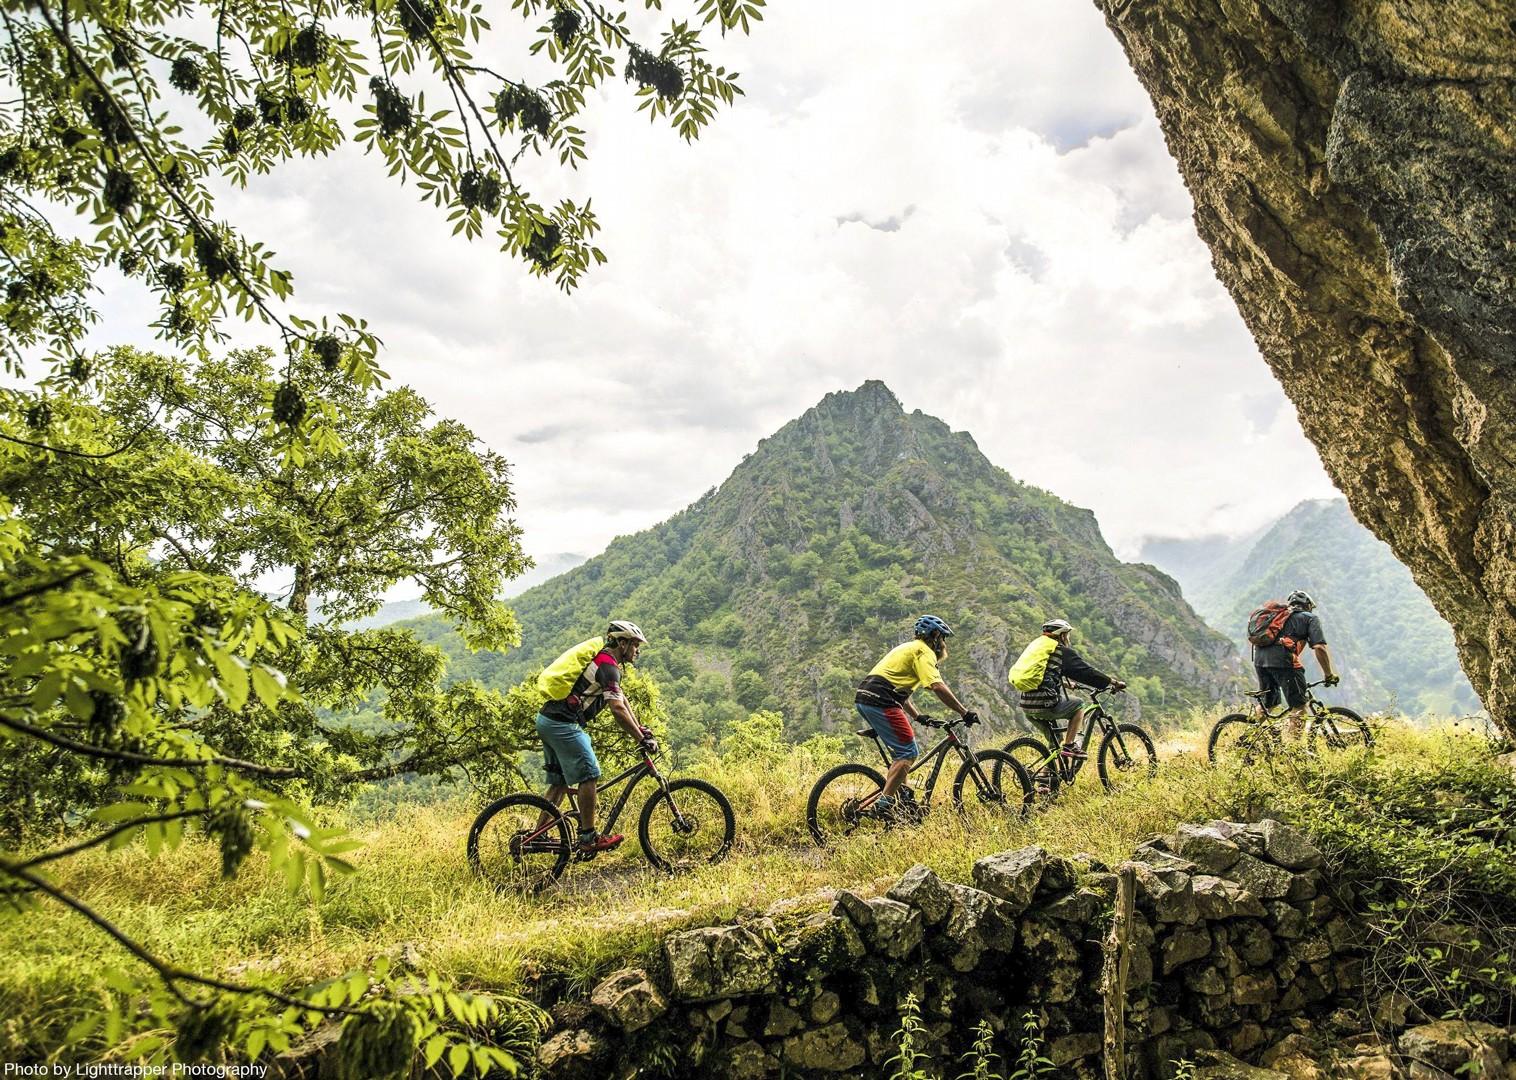 _Holiday.60.20916-2.jpg - Spain - Picos de Europa - Trans Picos - Guided Mountain Bike Holiday - Mountain Biking